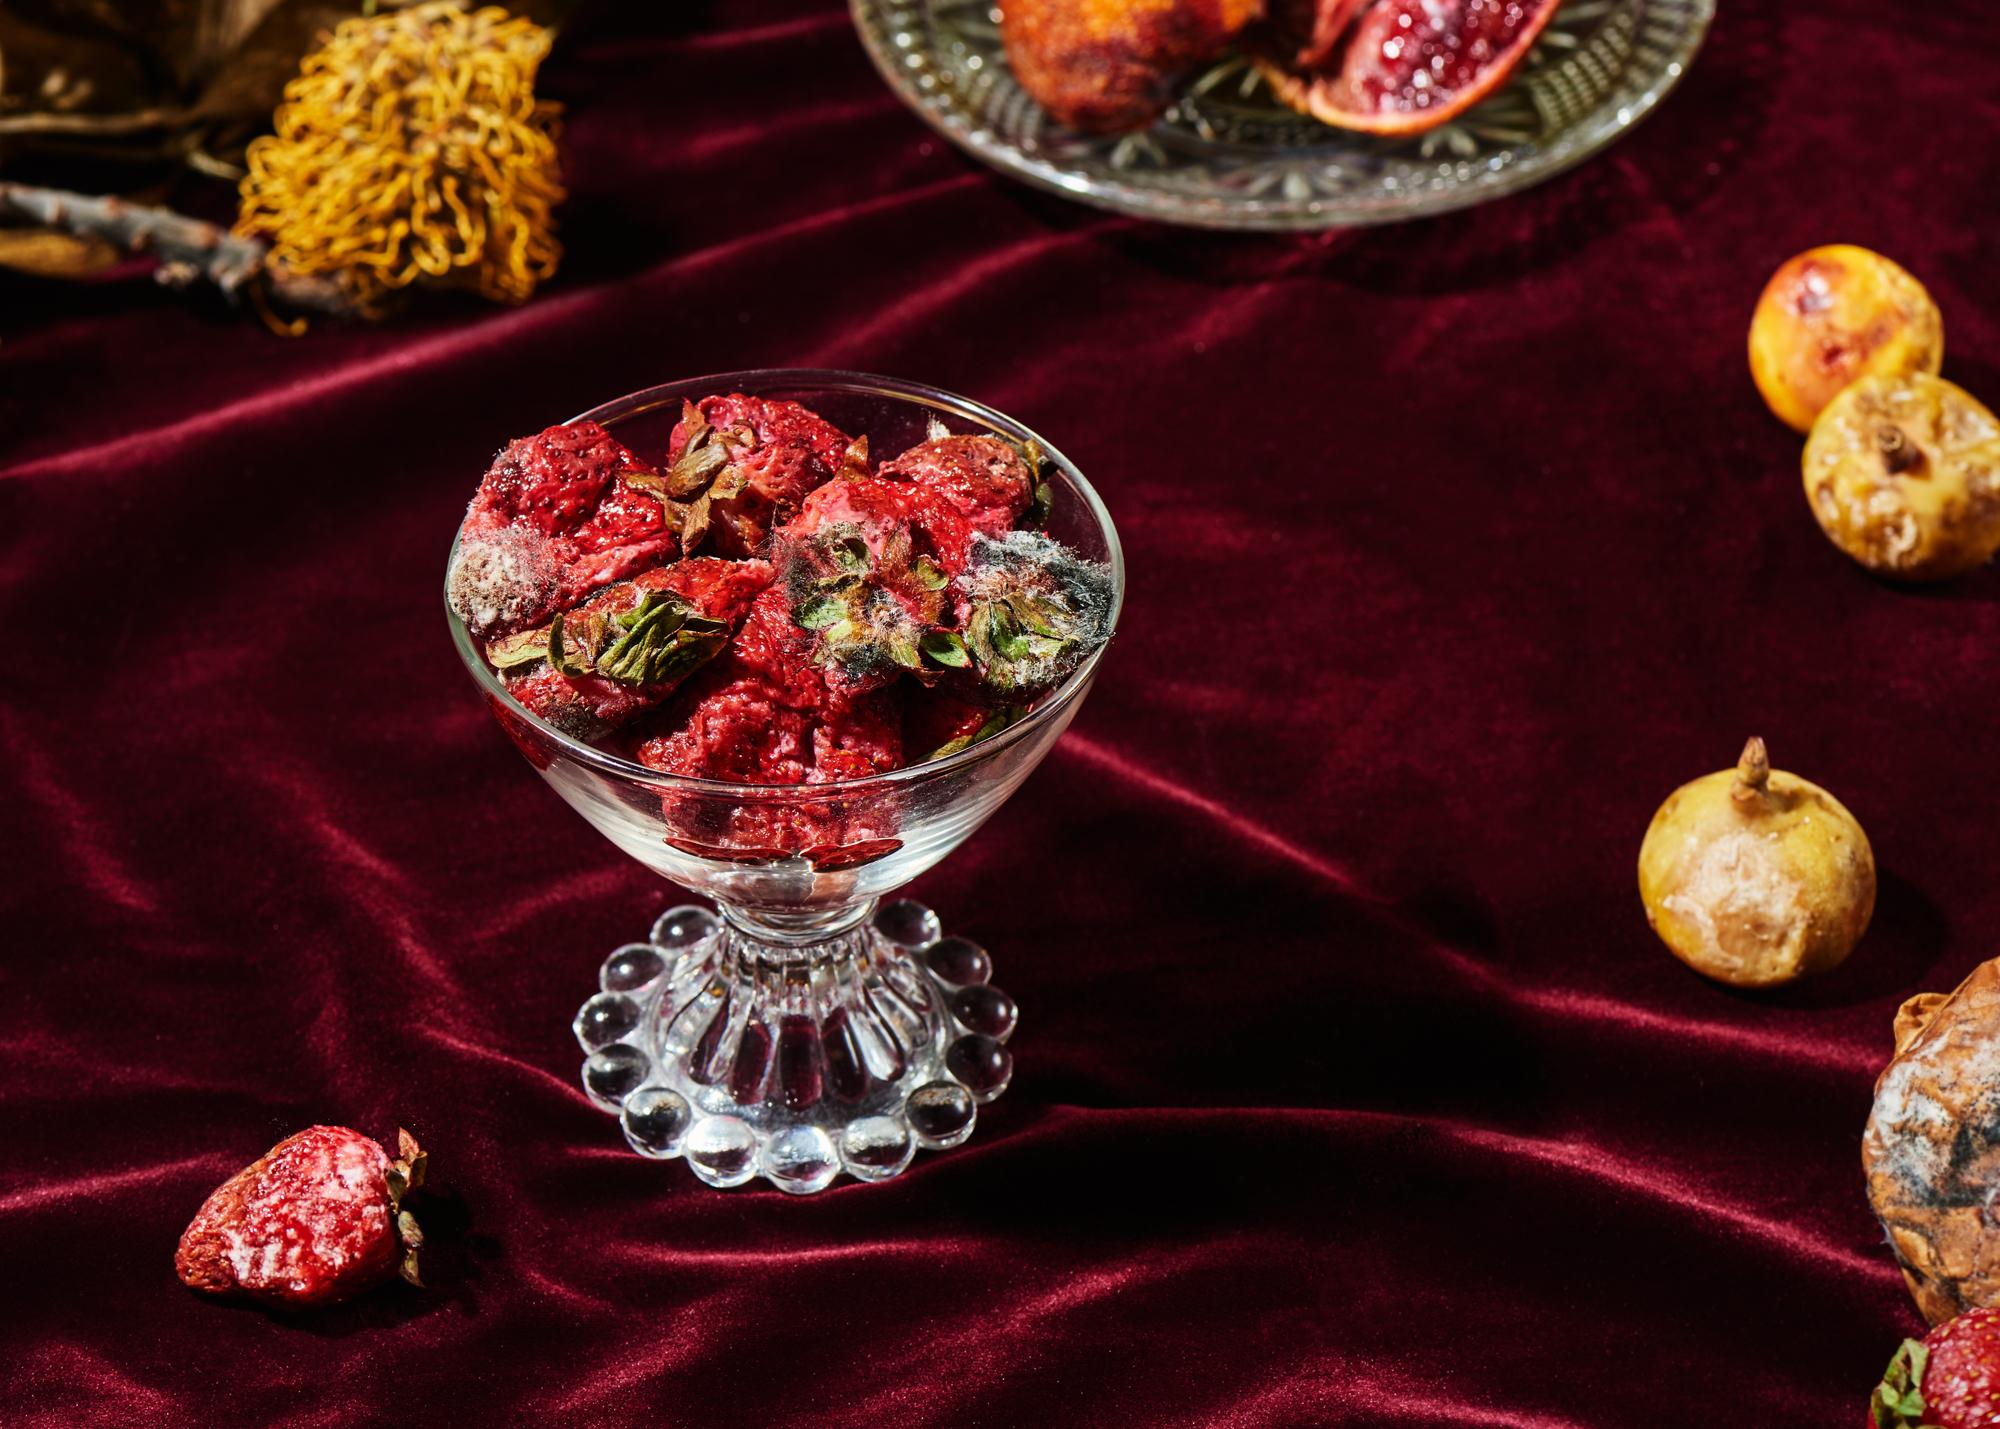 Spoiled-Rotten-Fruit-Scene-Yasara-Gunawardena